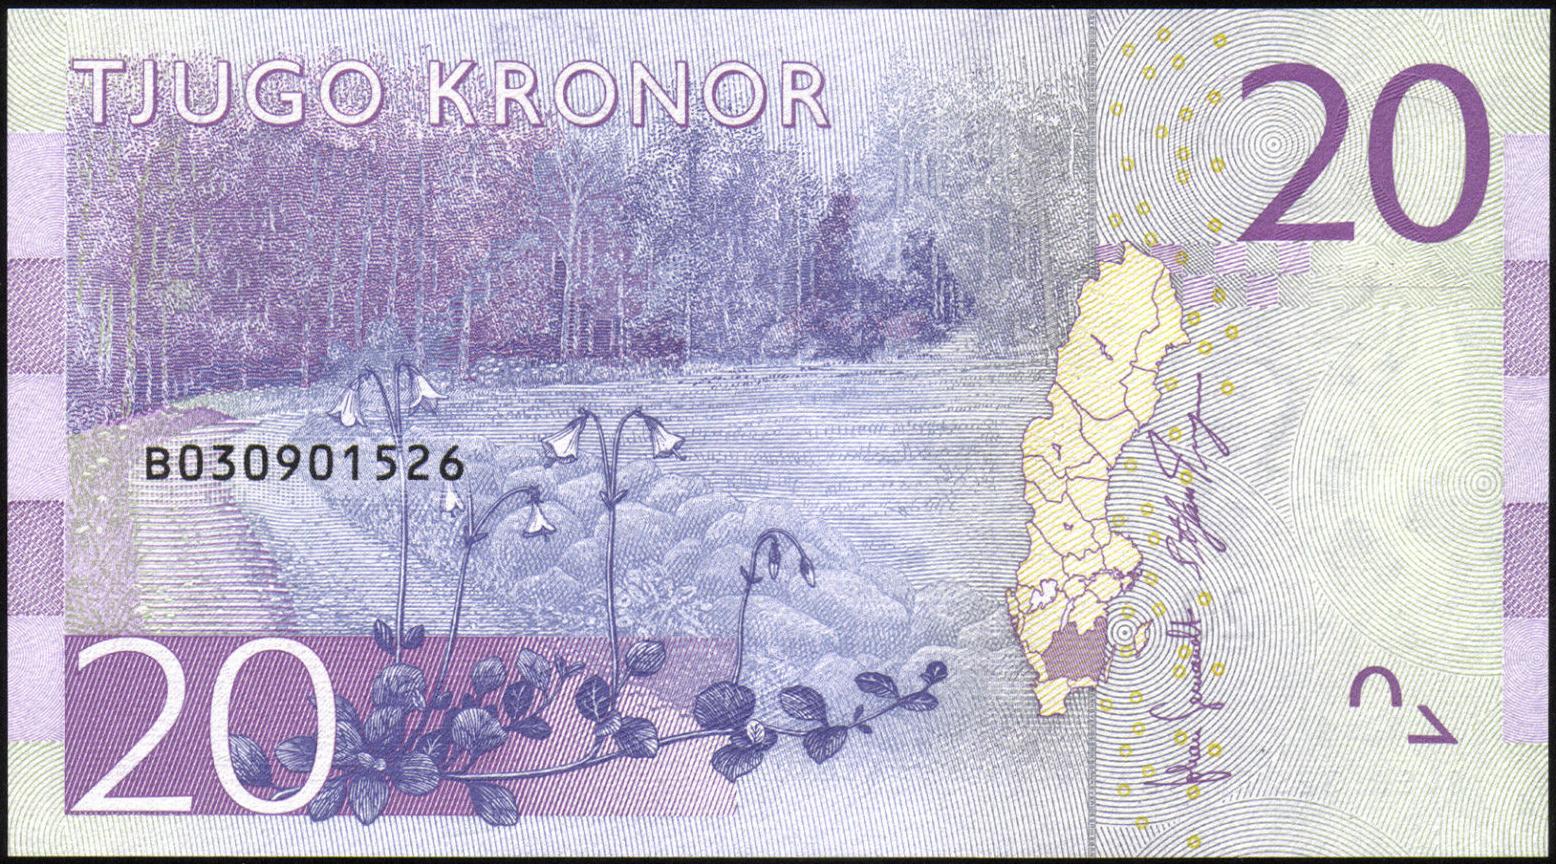 Sweden 20 Krona banknote 2015